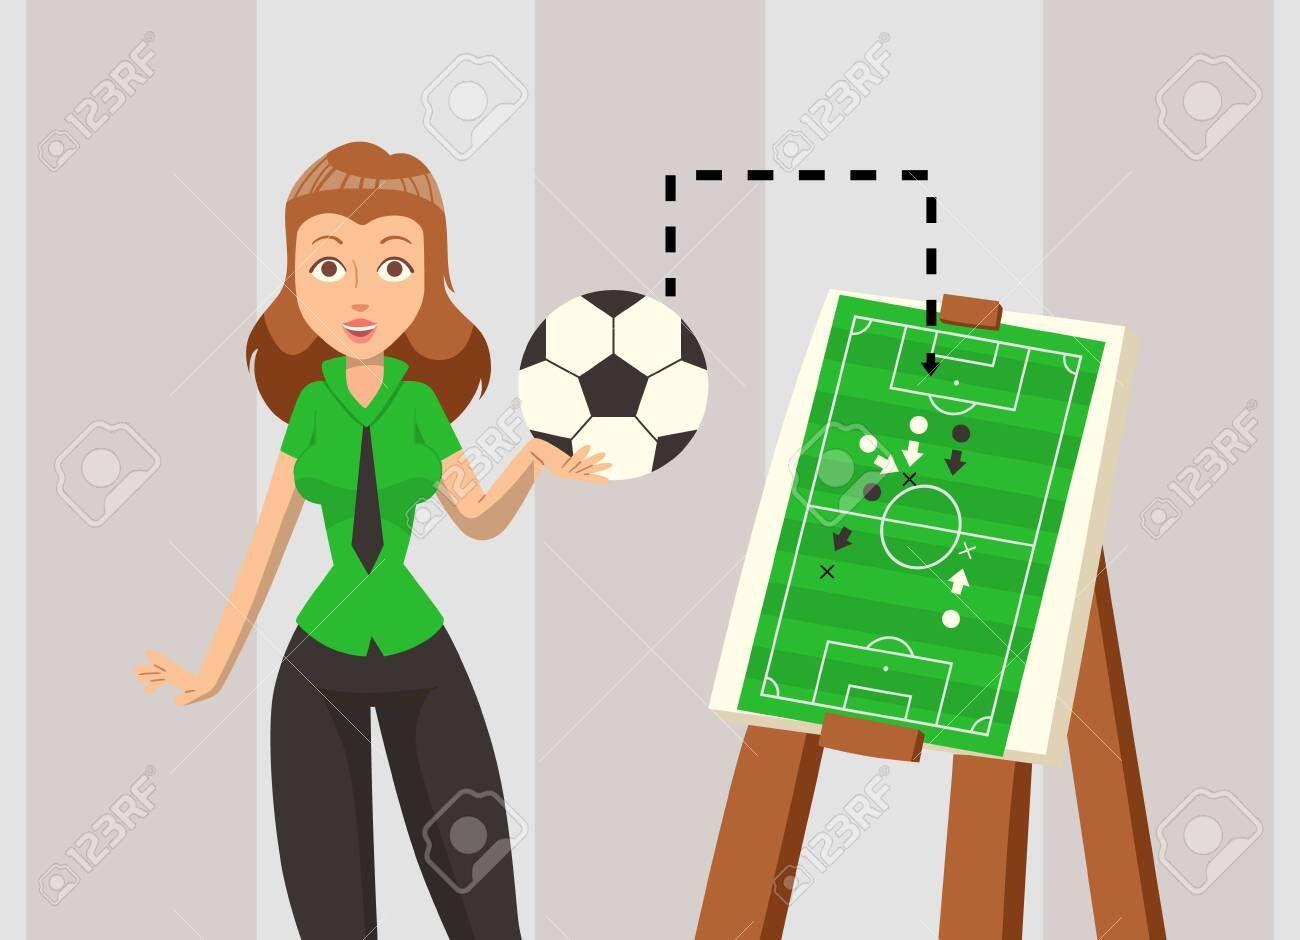 Female Soccer Coach Explaining Game Strategy Vector Illustration Football Team Plan Scheme Woman Ca In 2020 Social Media Design Graphics Team Teaching Small Designs